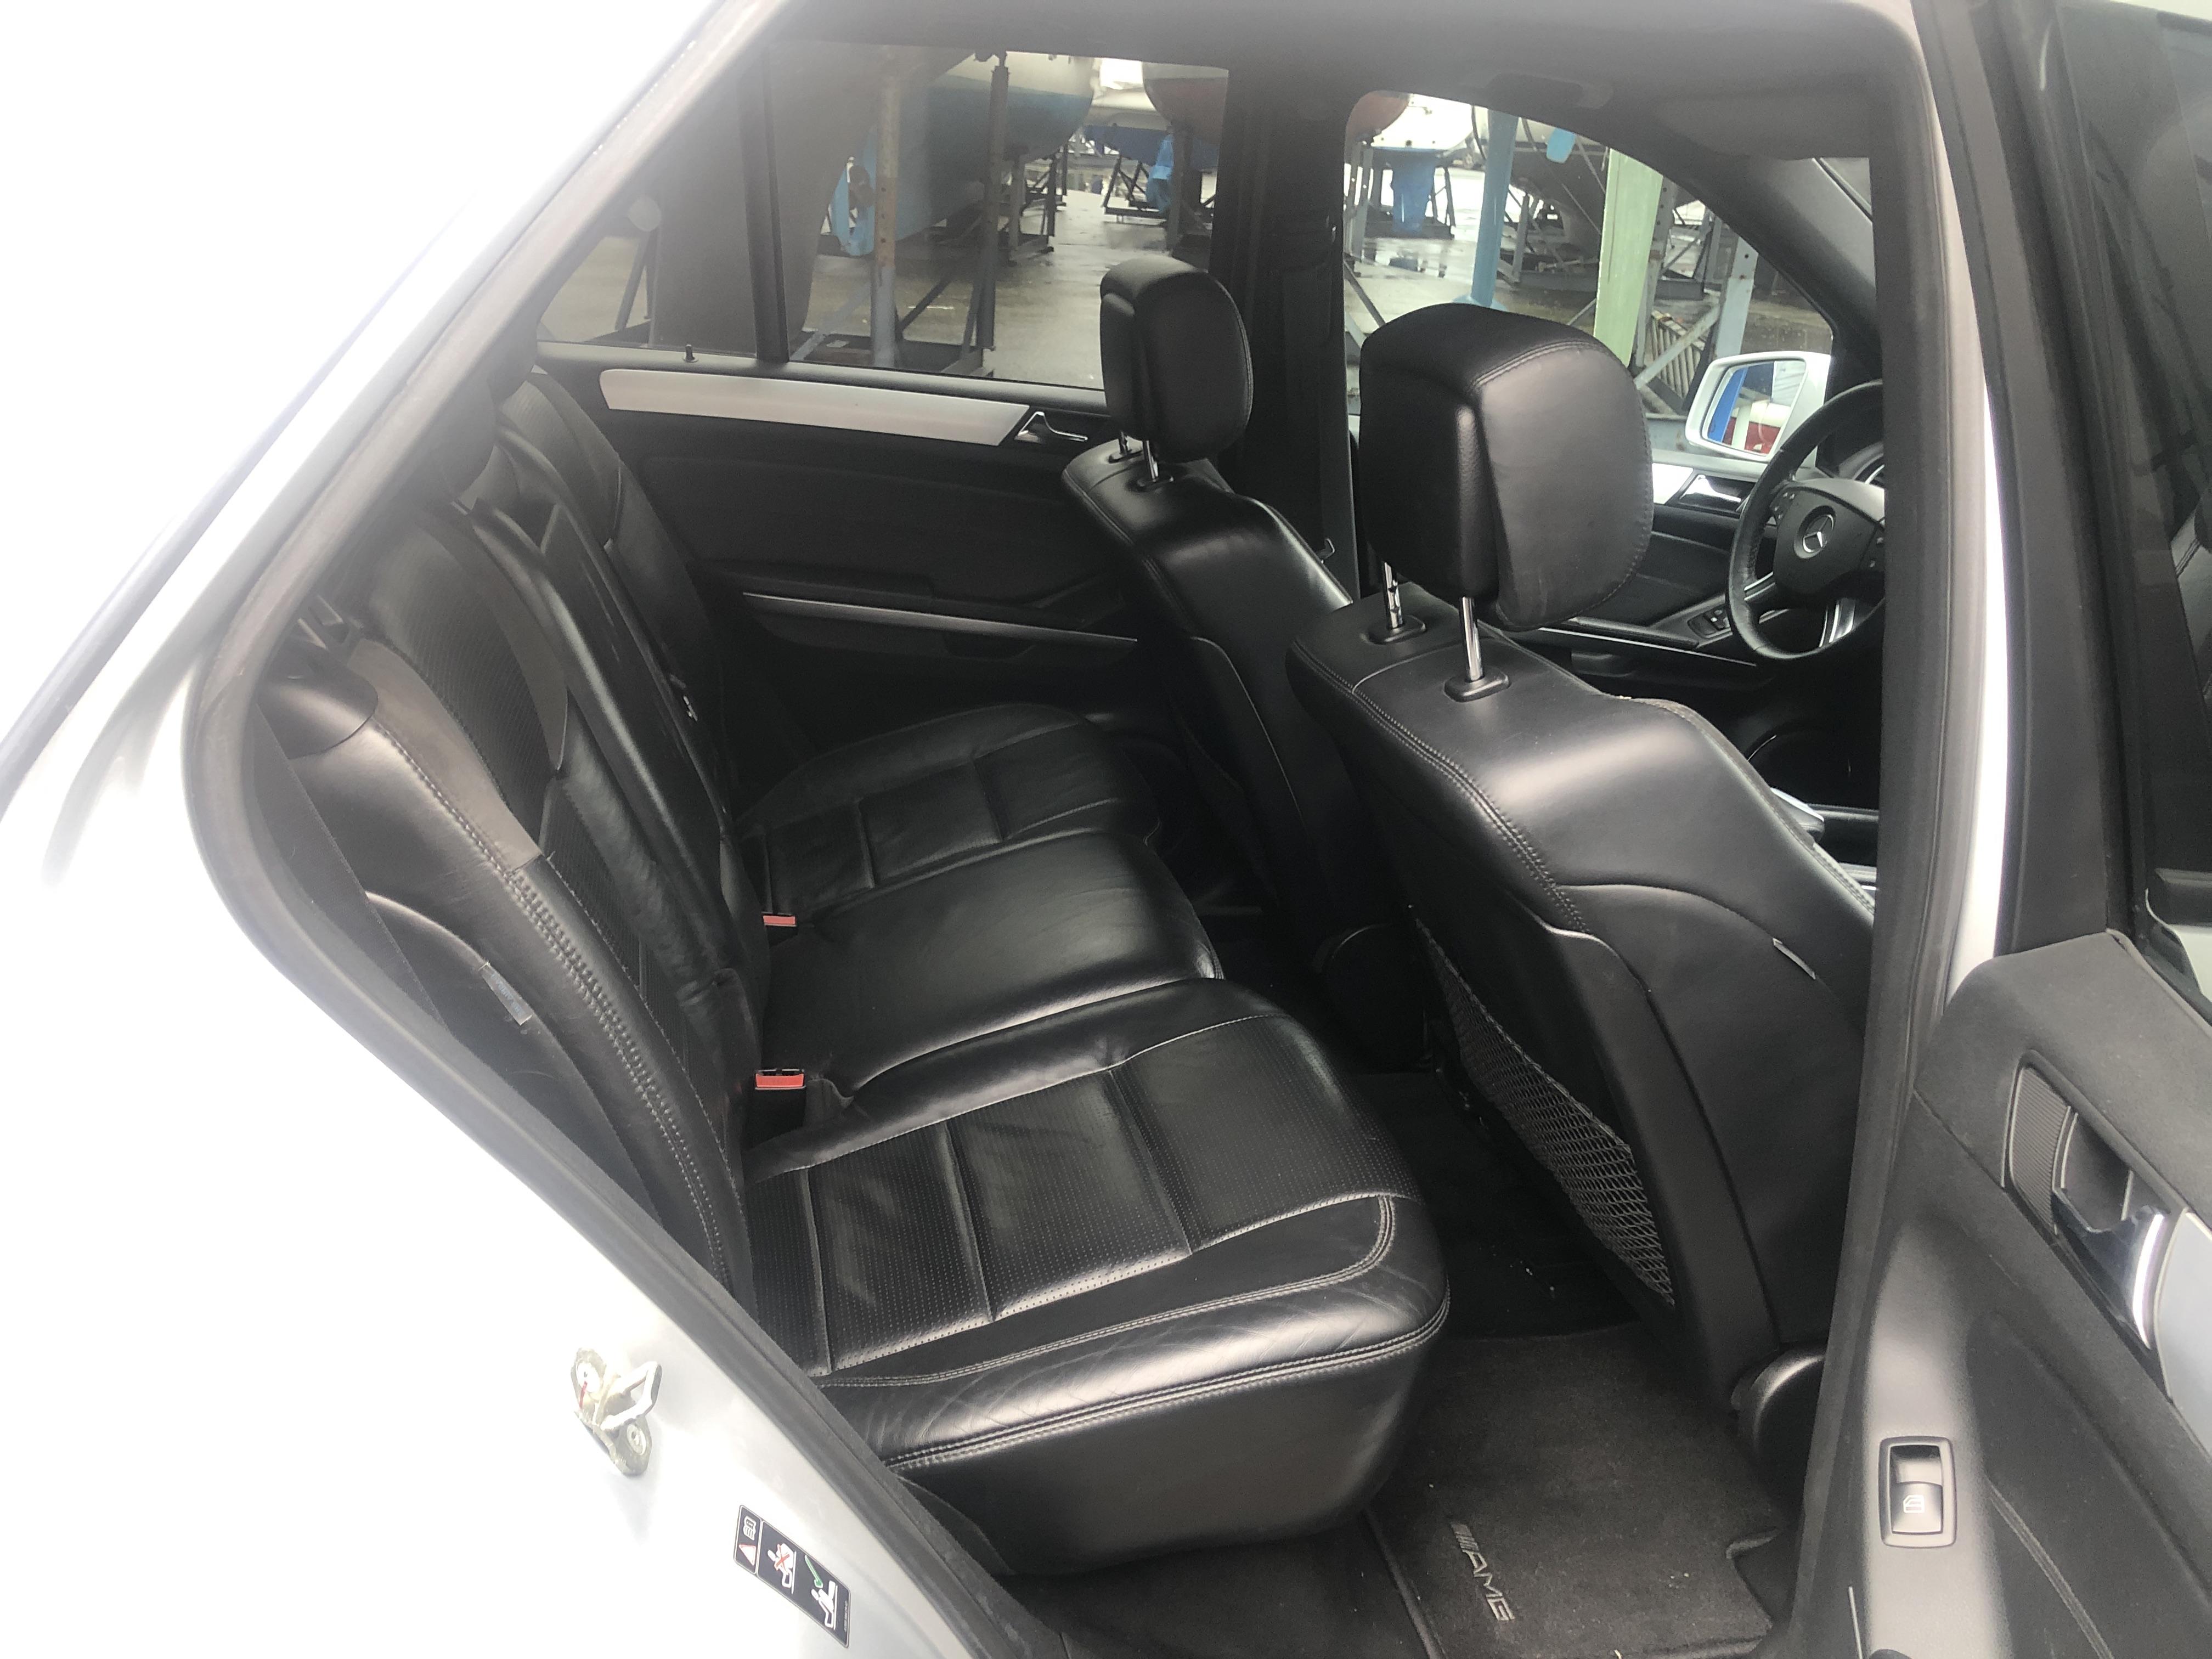 Mercedes ML 63 AMG Facelift Black Edition